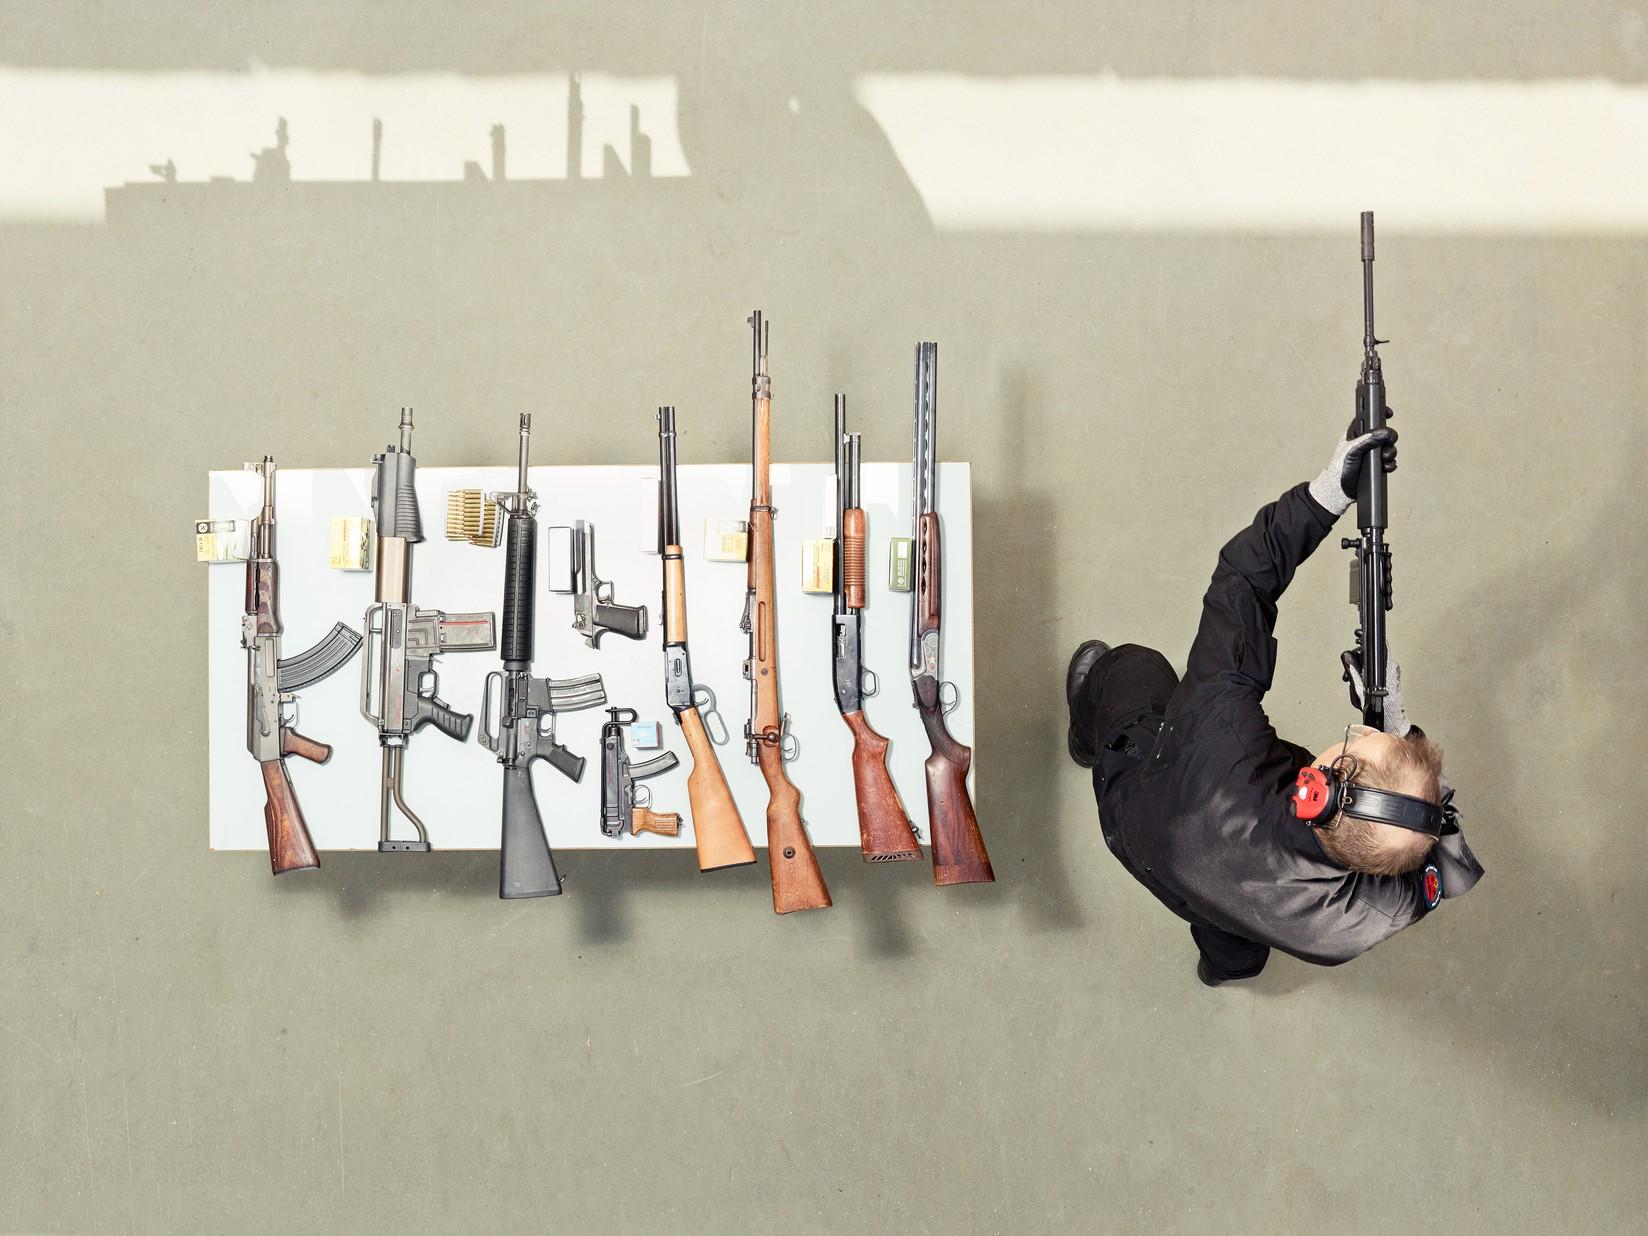 Как готовят криминалистов в Голландии (24 фото)